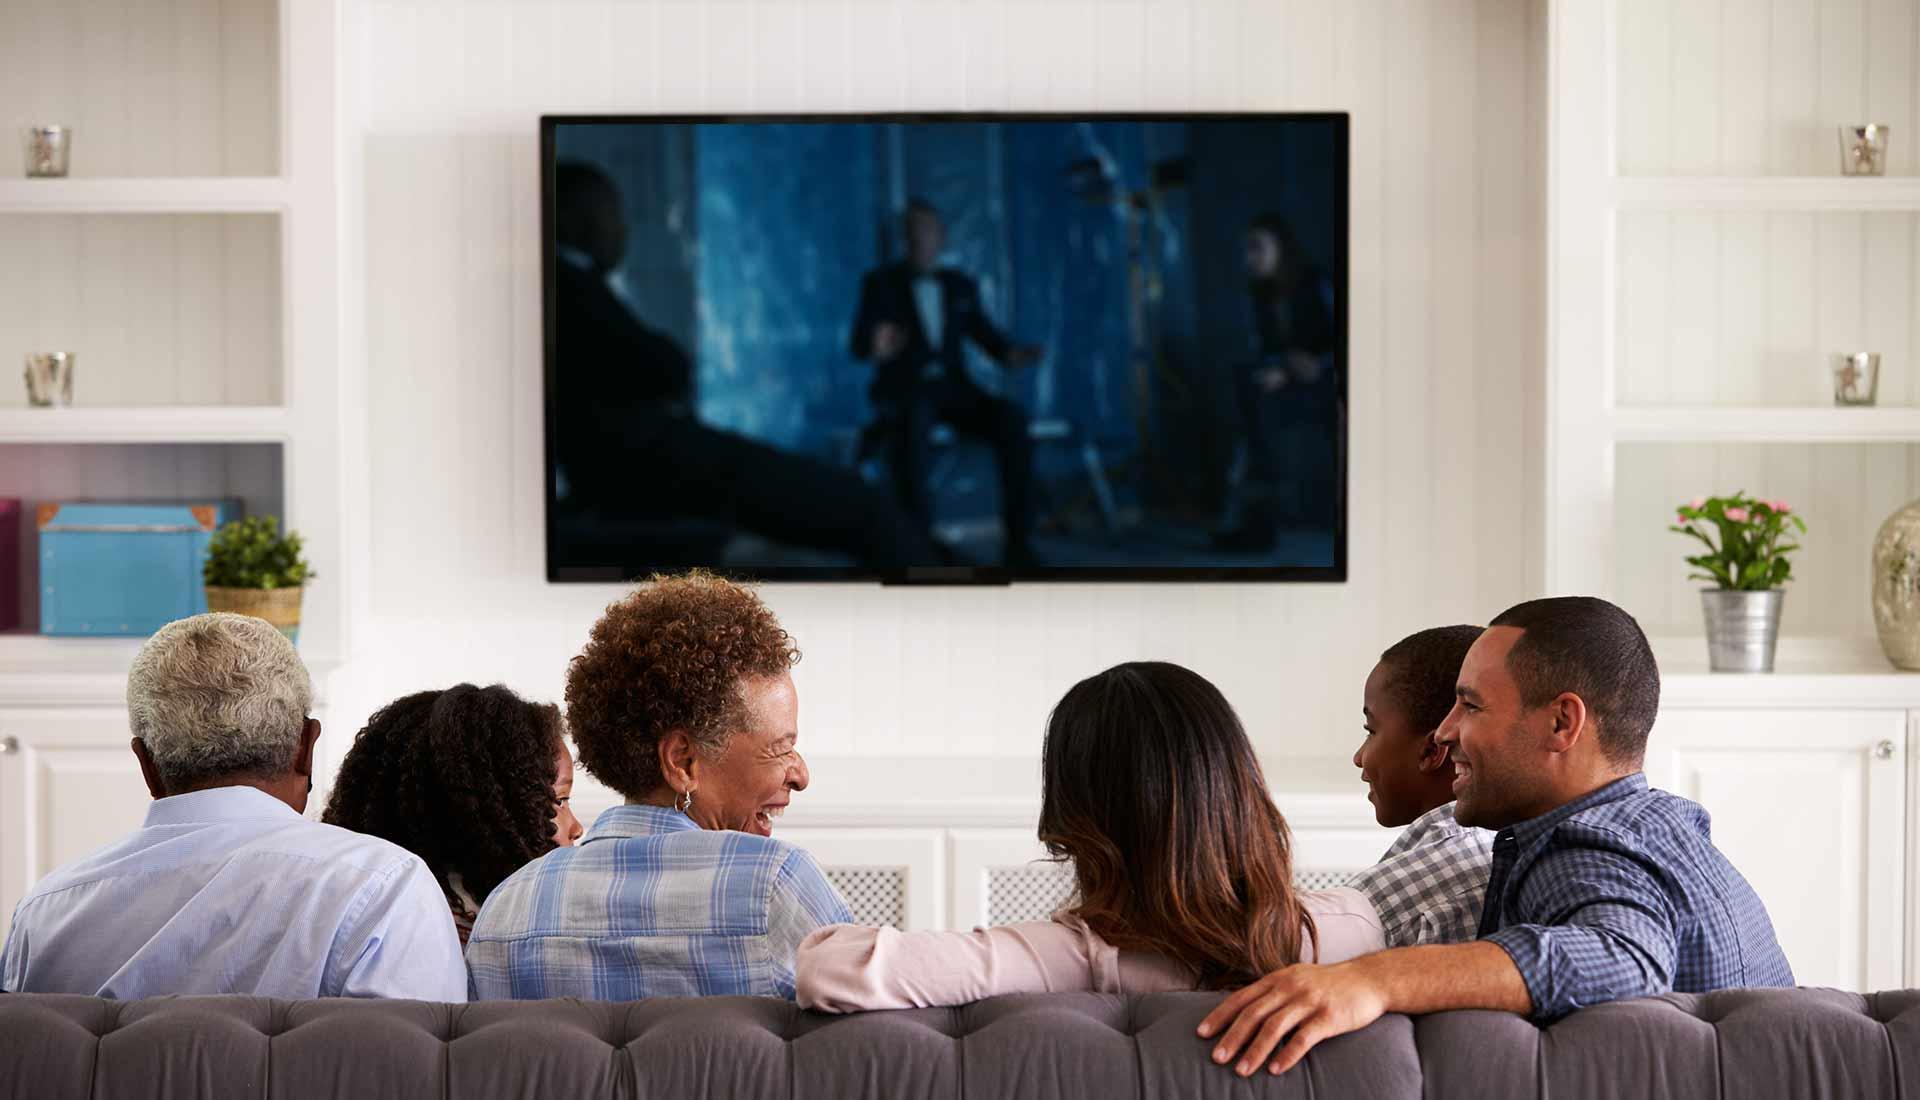 TV wall hanging brings elegance viewing comfort